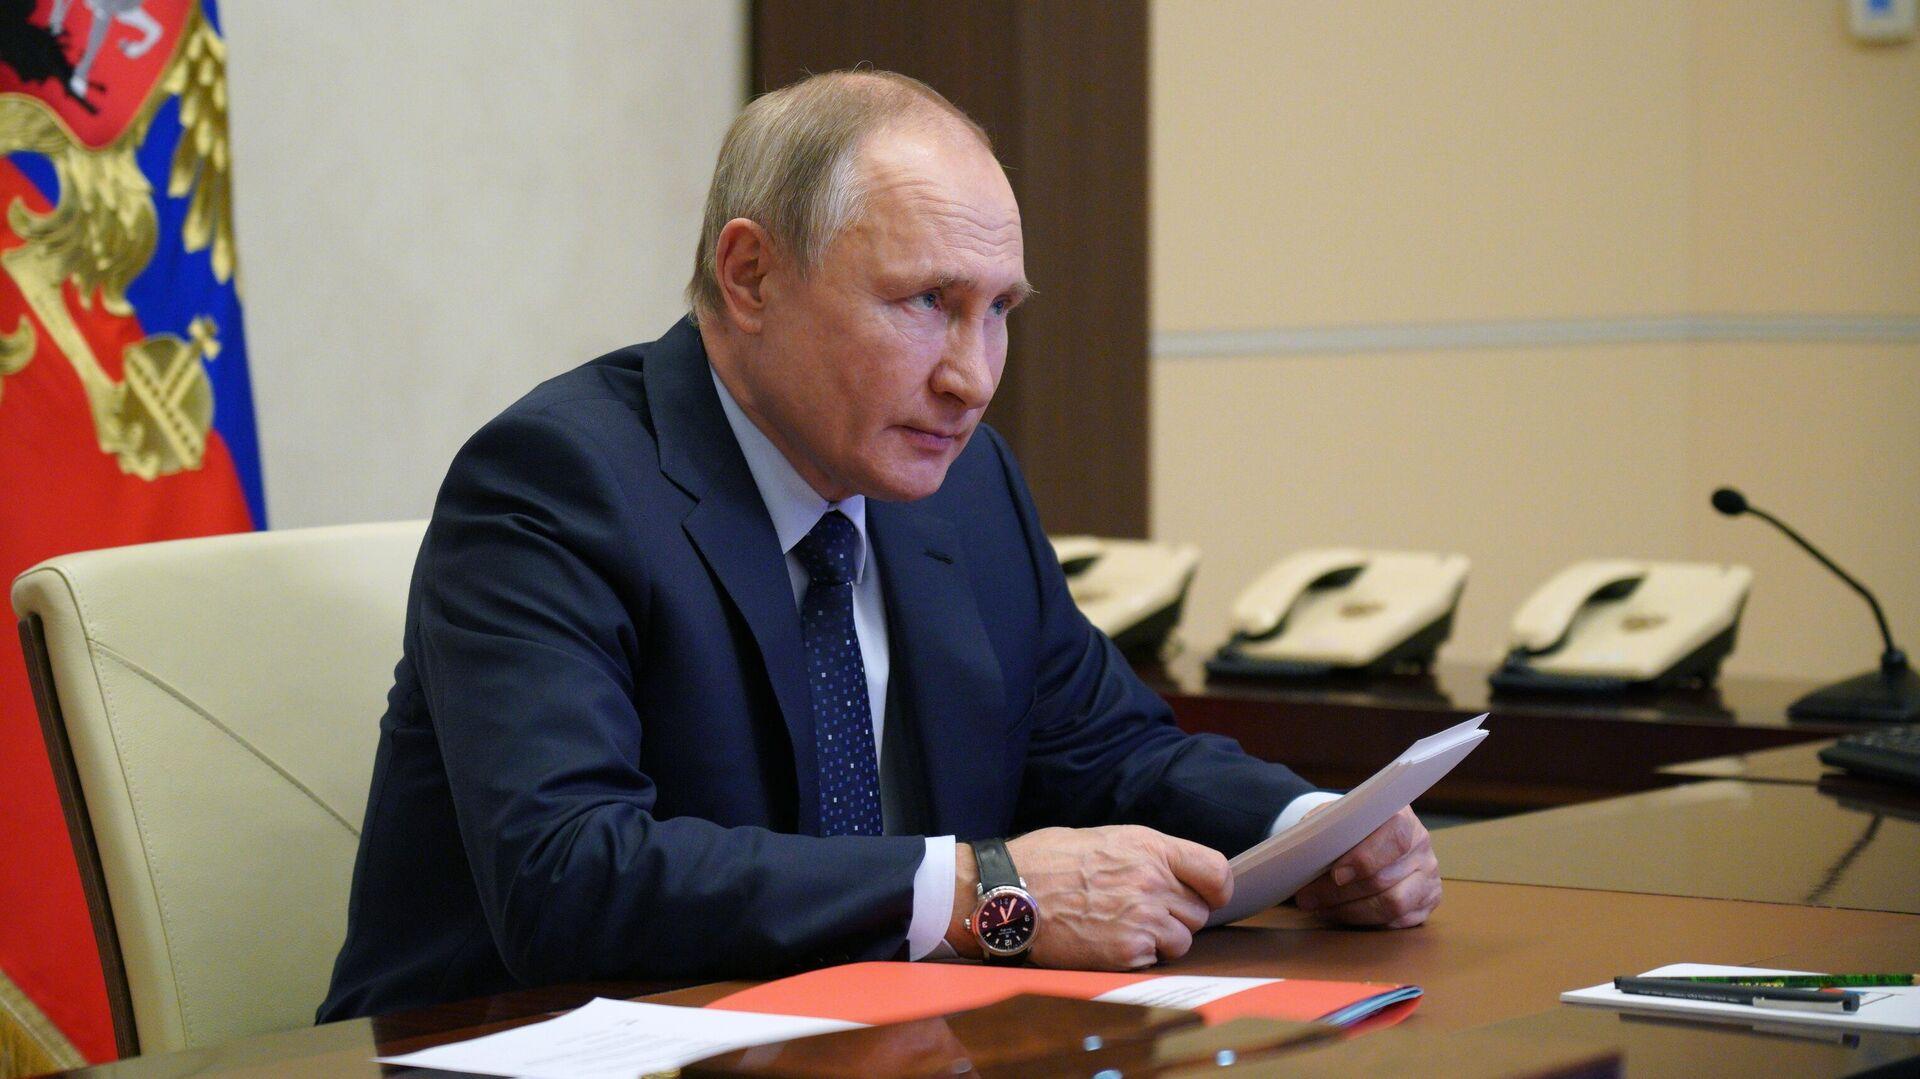 Путин подписал закон, позволяющий ему баллотироваться на пост президента